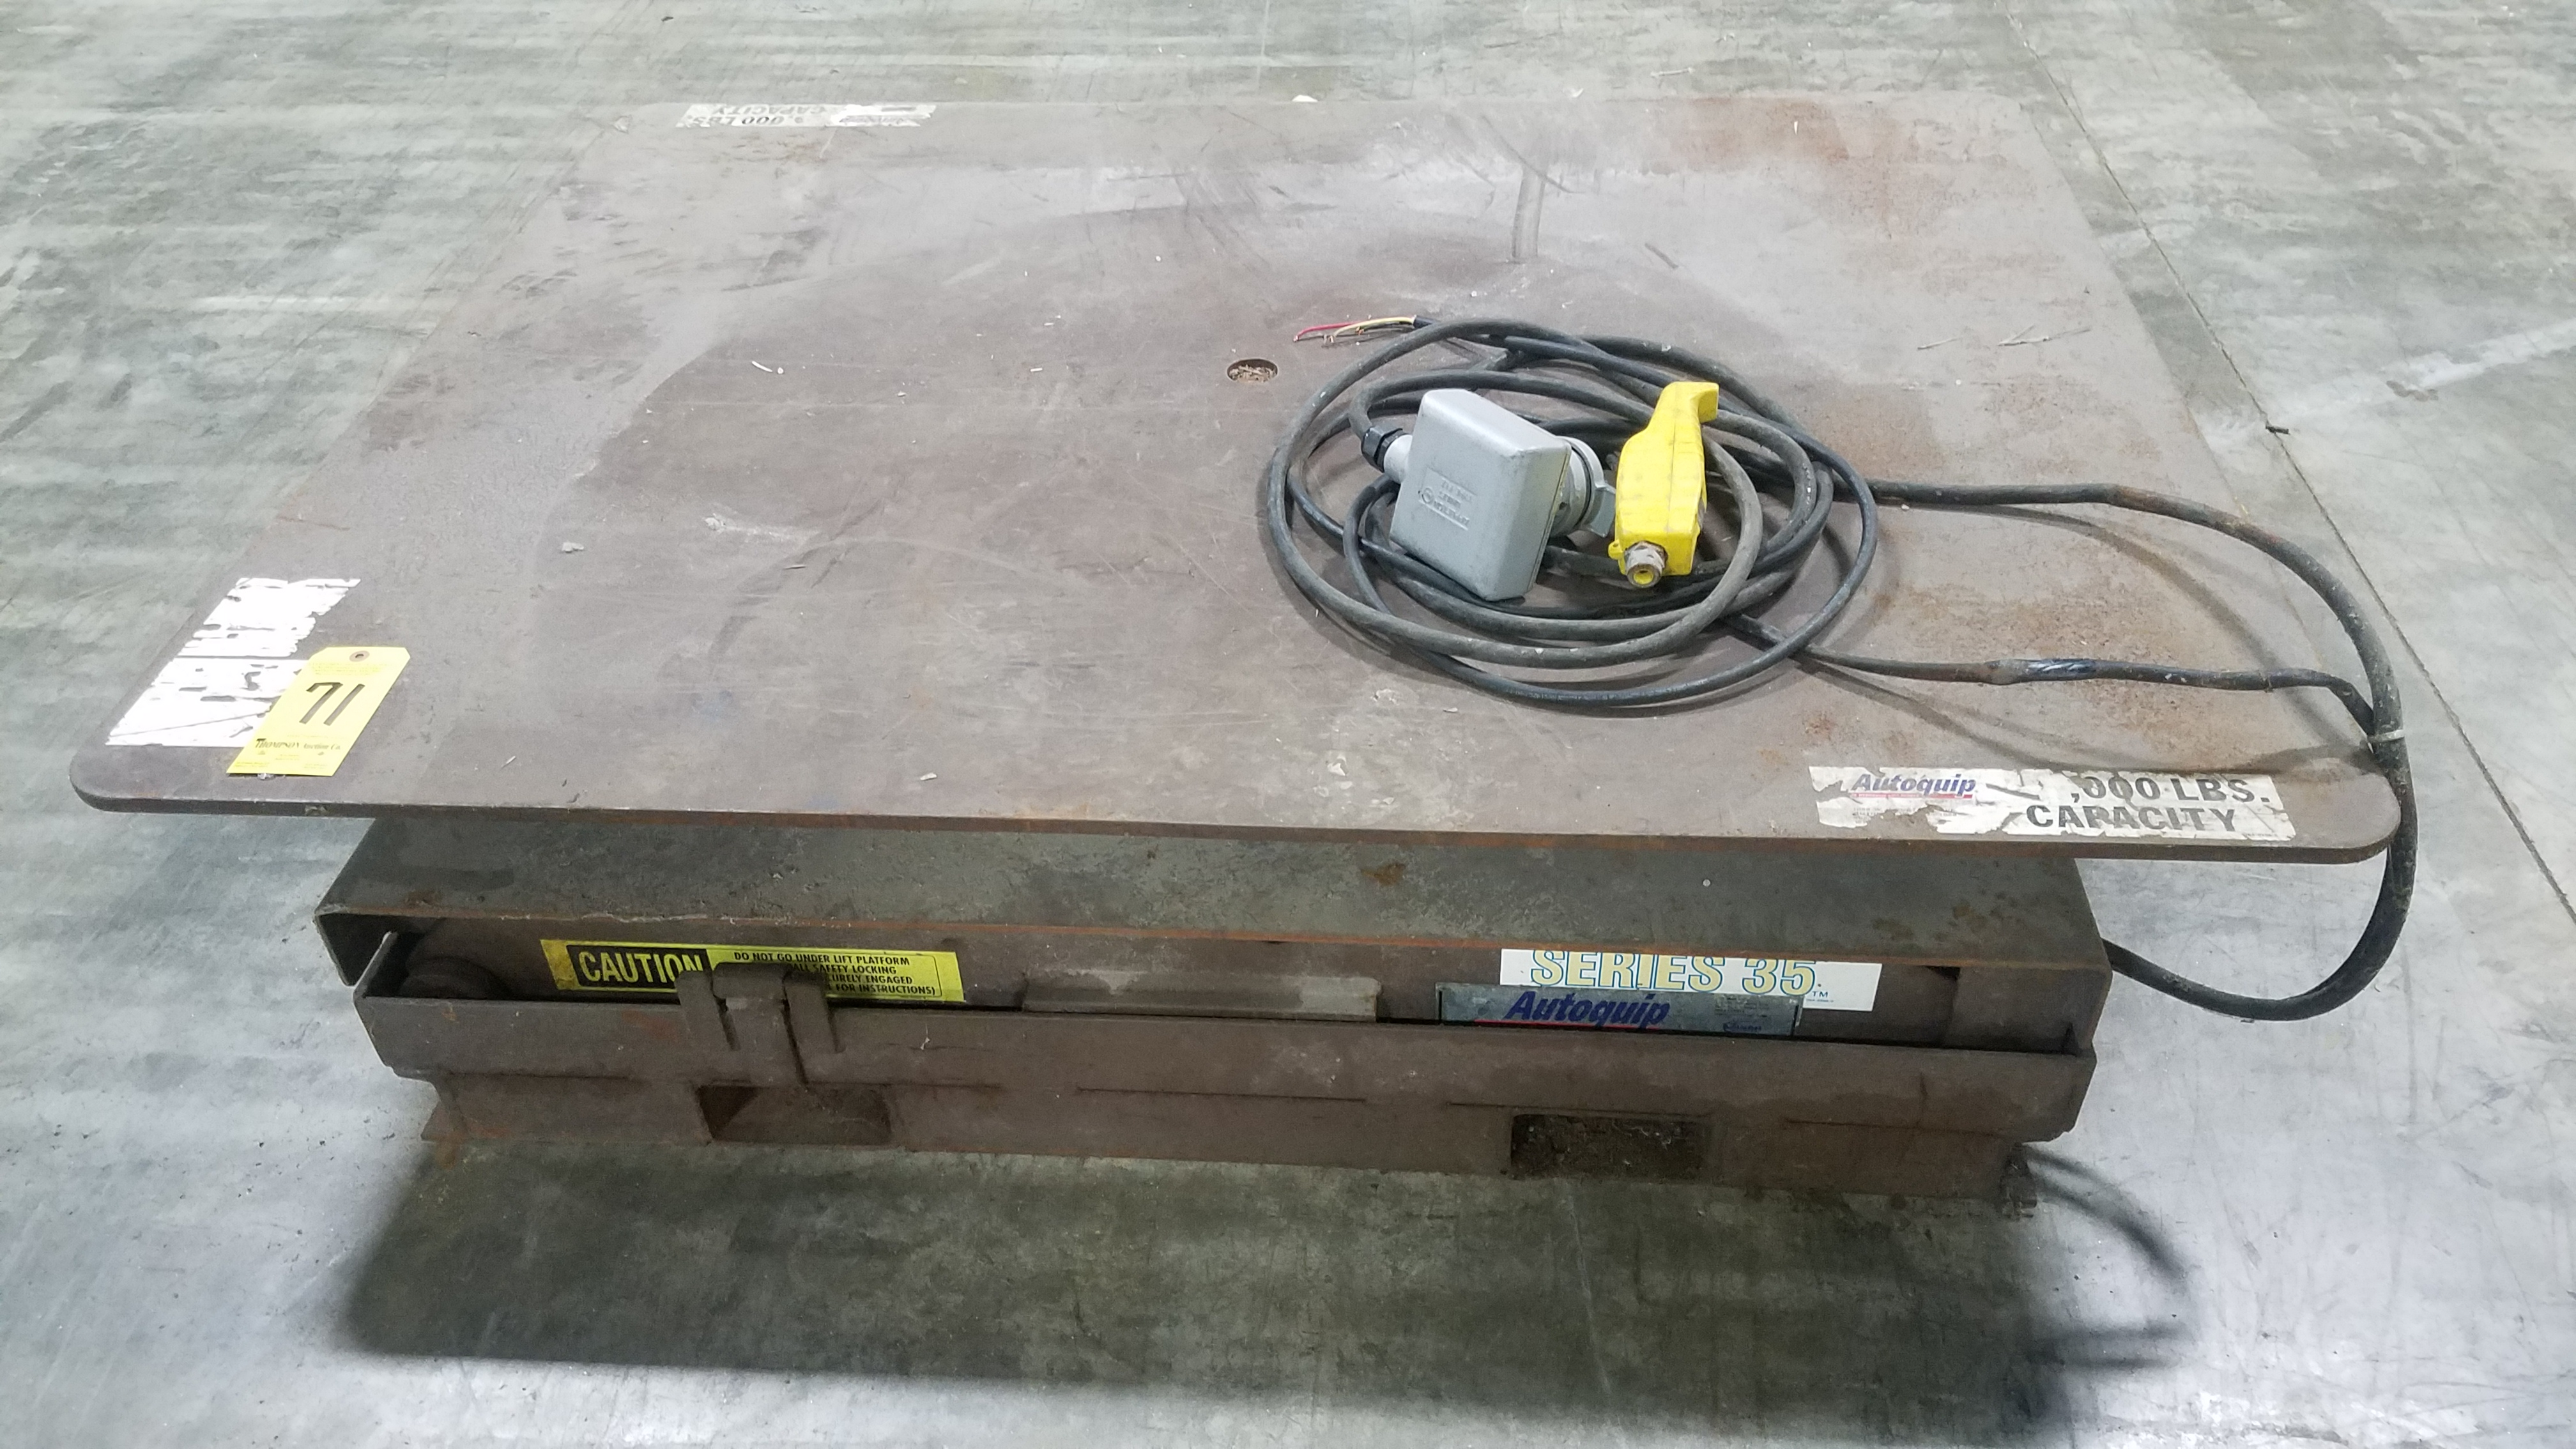 Lot 71 - Autoquip Series 35 Scissor Lift Table, 4 Ft. X 5 Ft. Deck